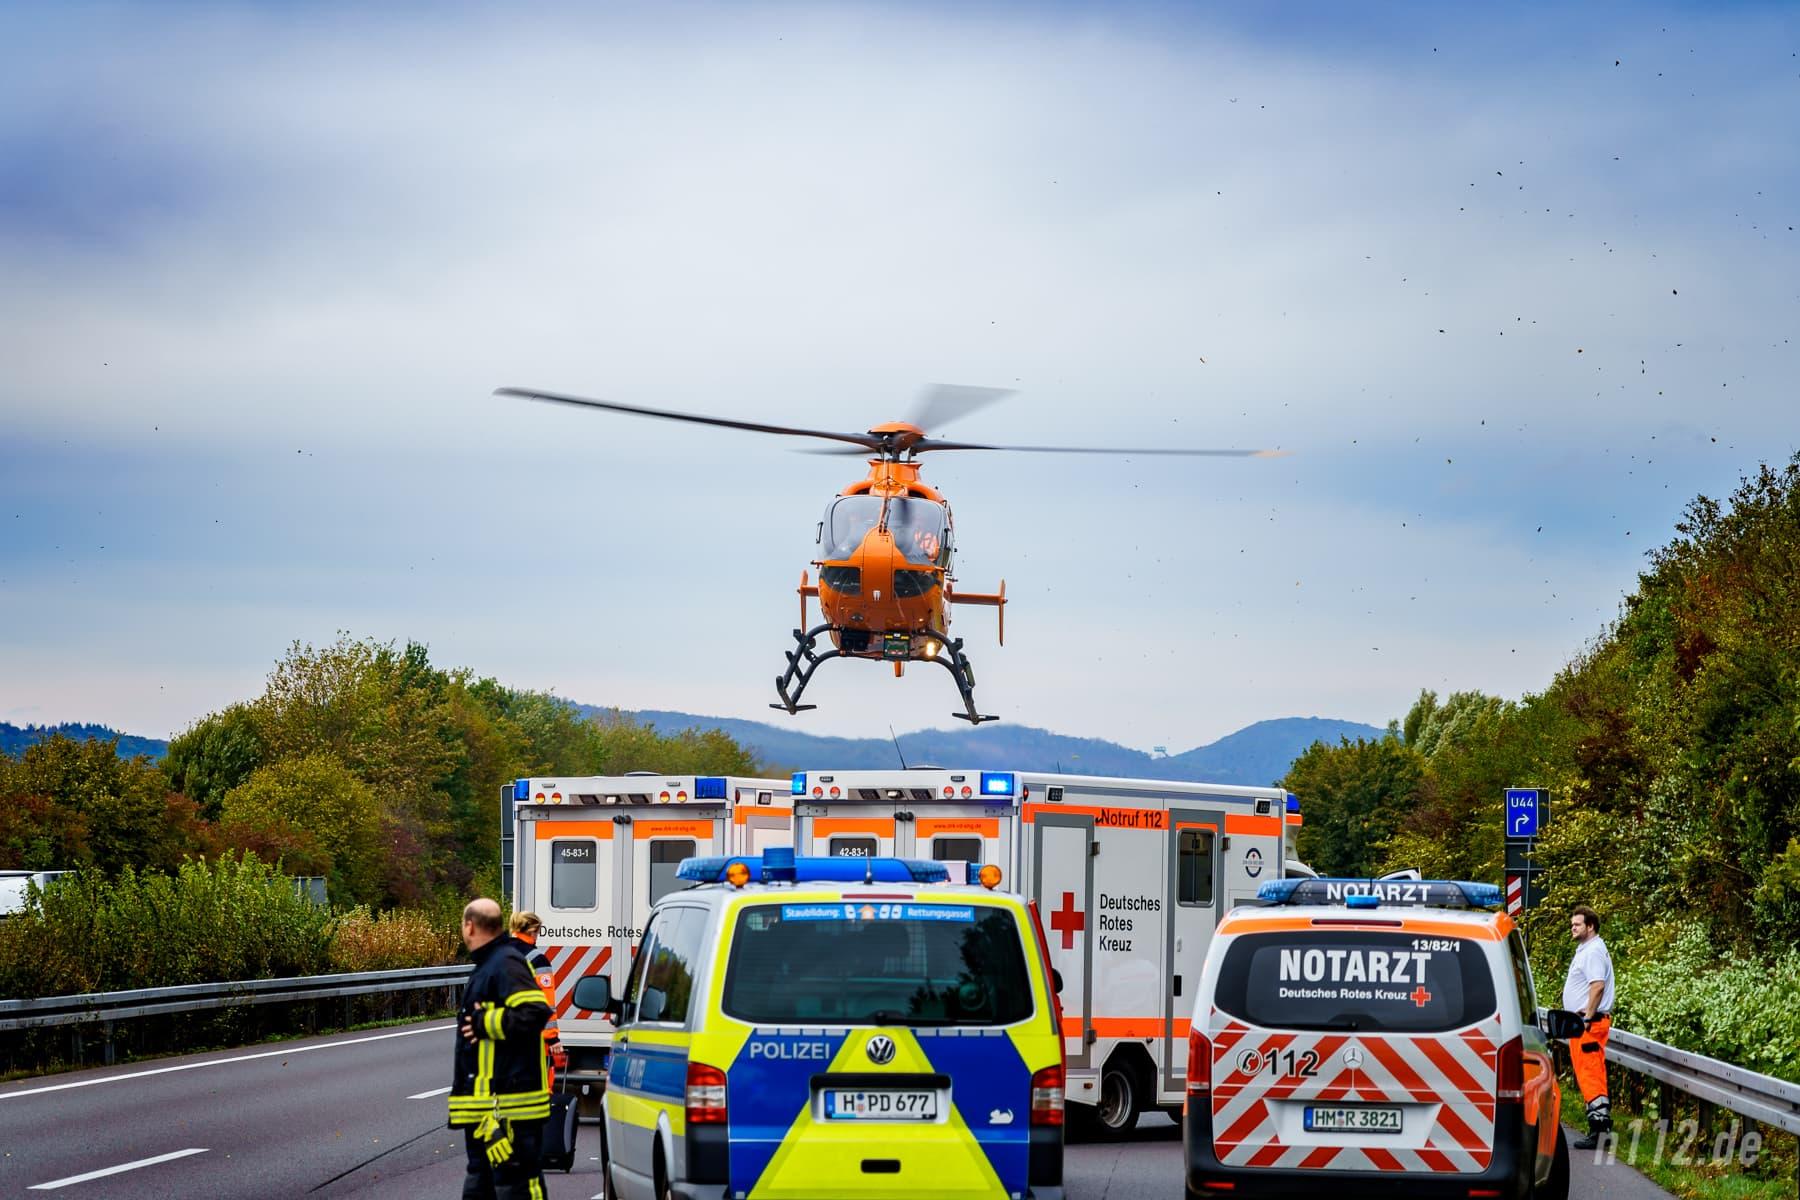 Rettungshubschrauber Christoph 4 startet mit dem Verletzten (Foto: n112.de/Stefan Simonsen)